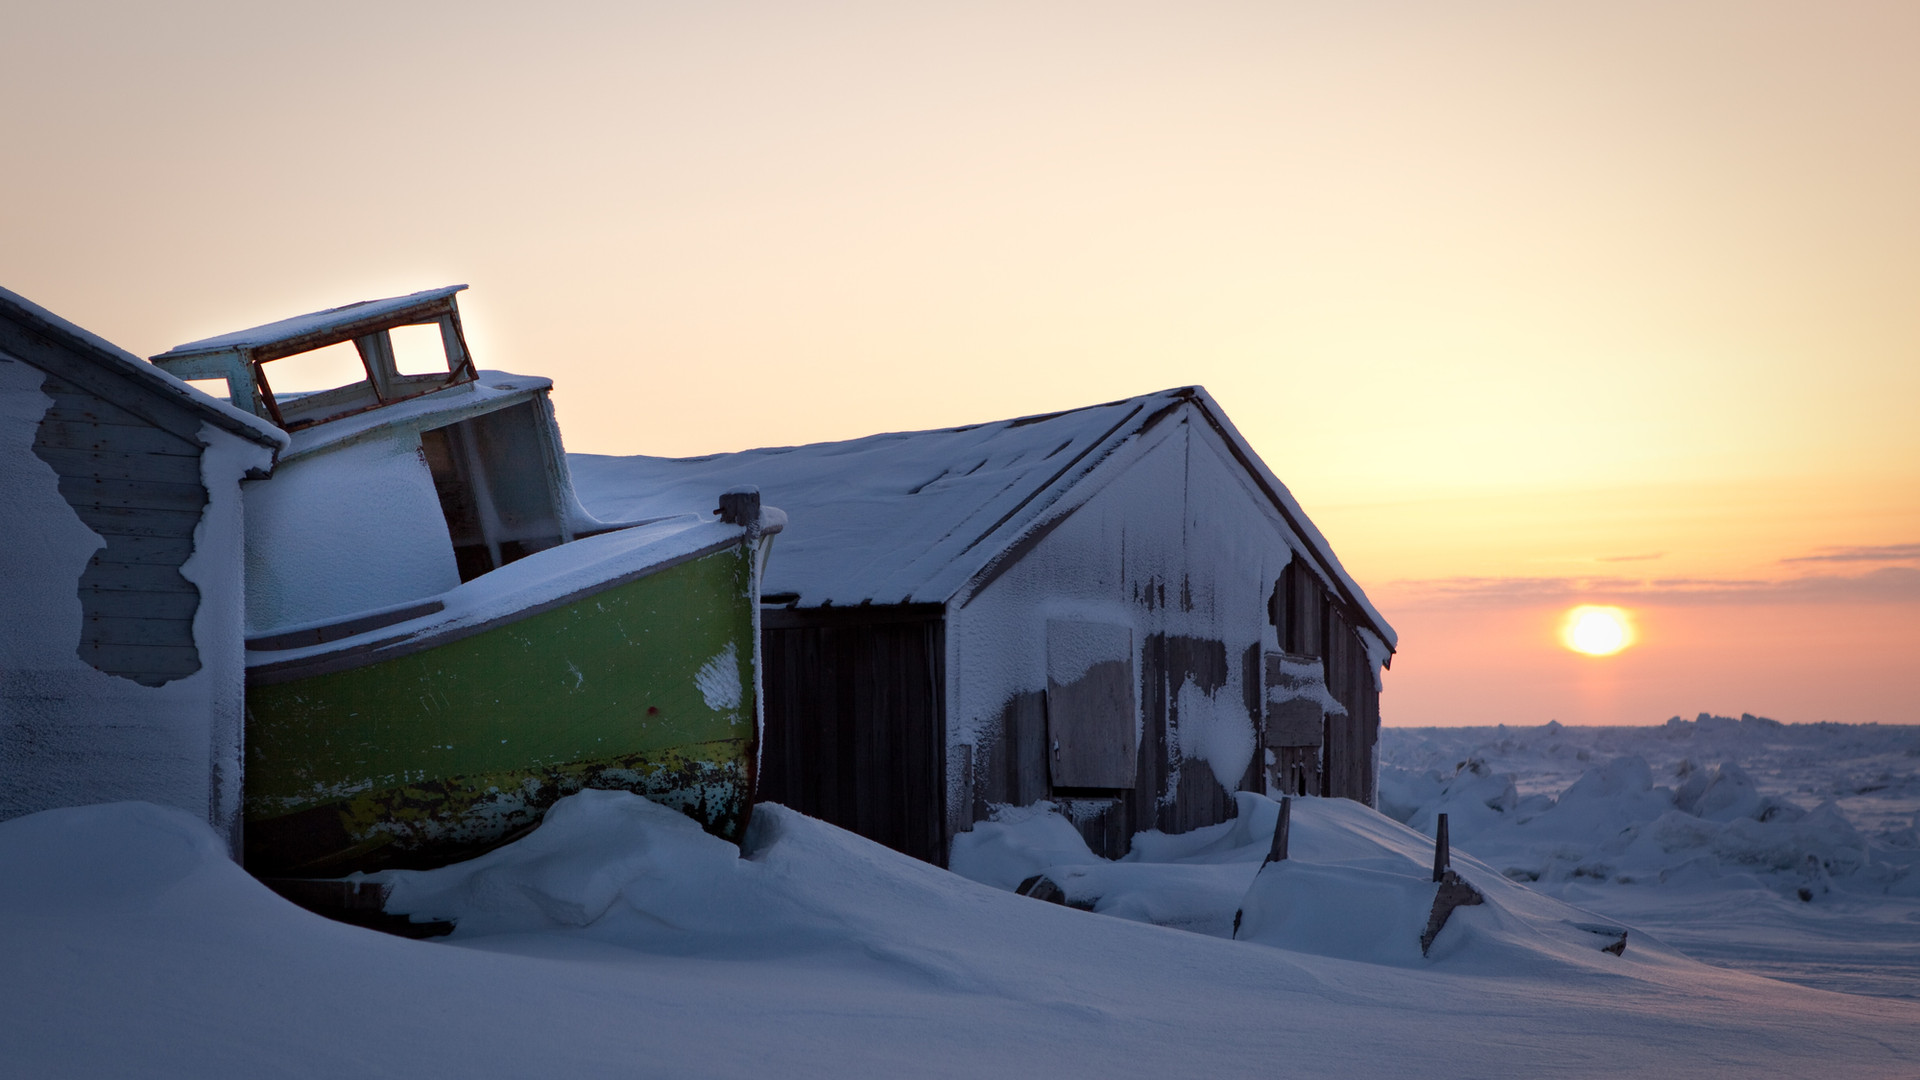 Utqiagvik, Alaska